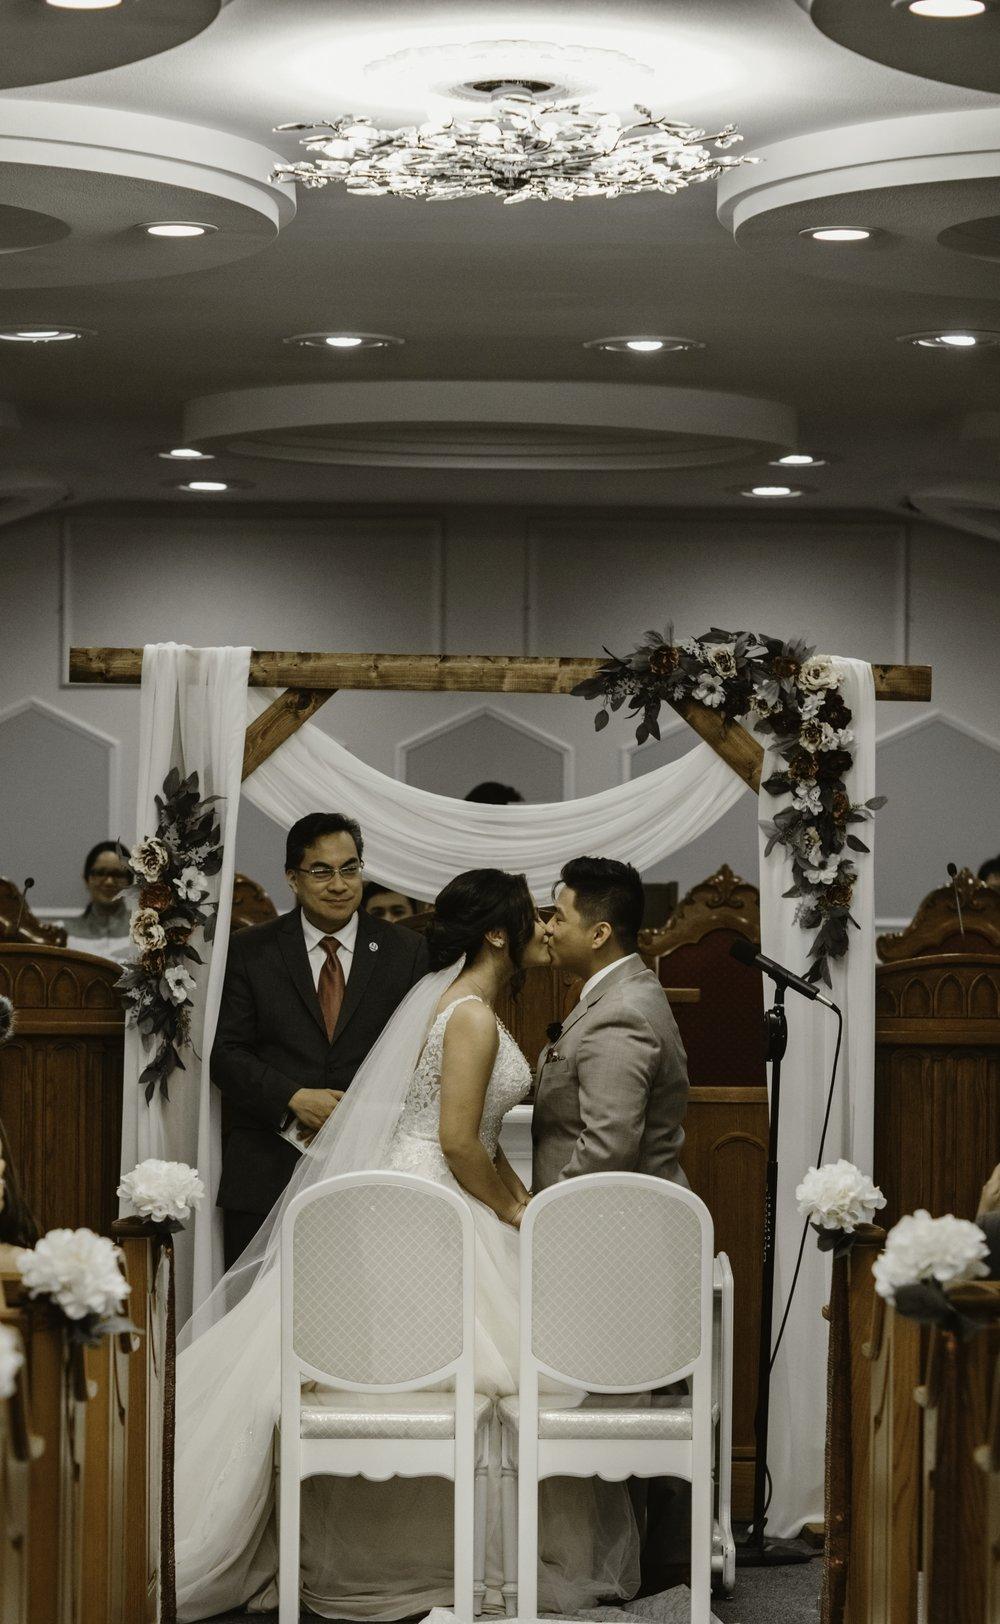 Wedding | St Augustine | Bay View at A1A aleworks| Roxanne and LJ | Vanessa Boy | Orlando Florida | Vanessa Boy | vanessaboy.com-160final.jpg